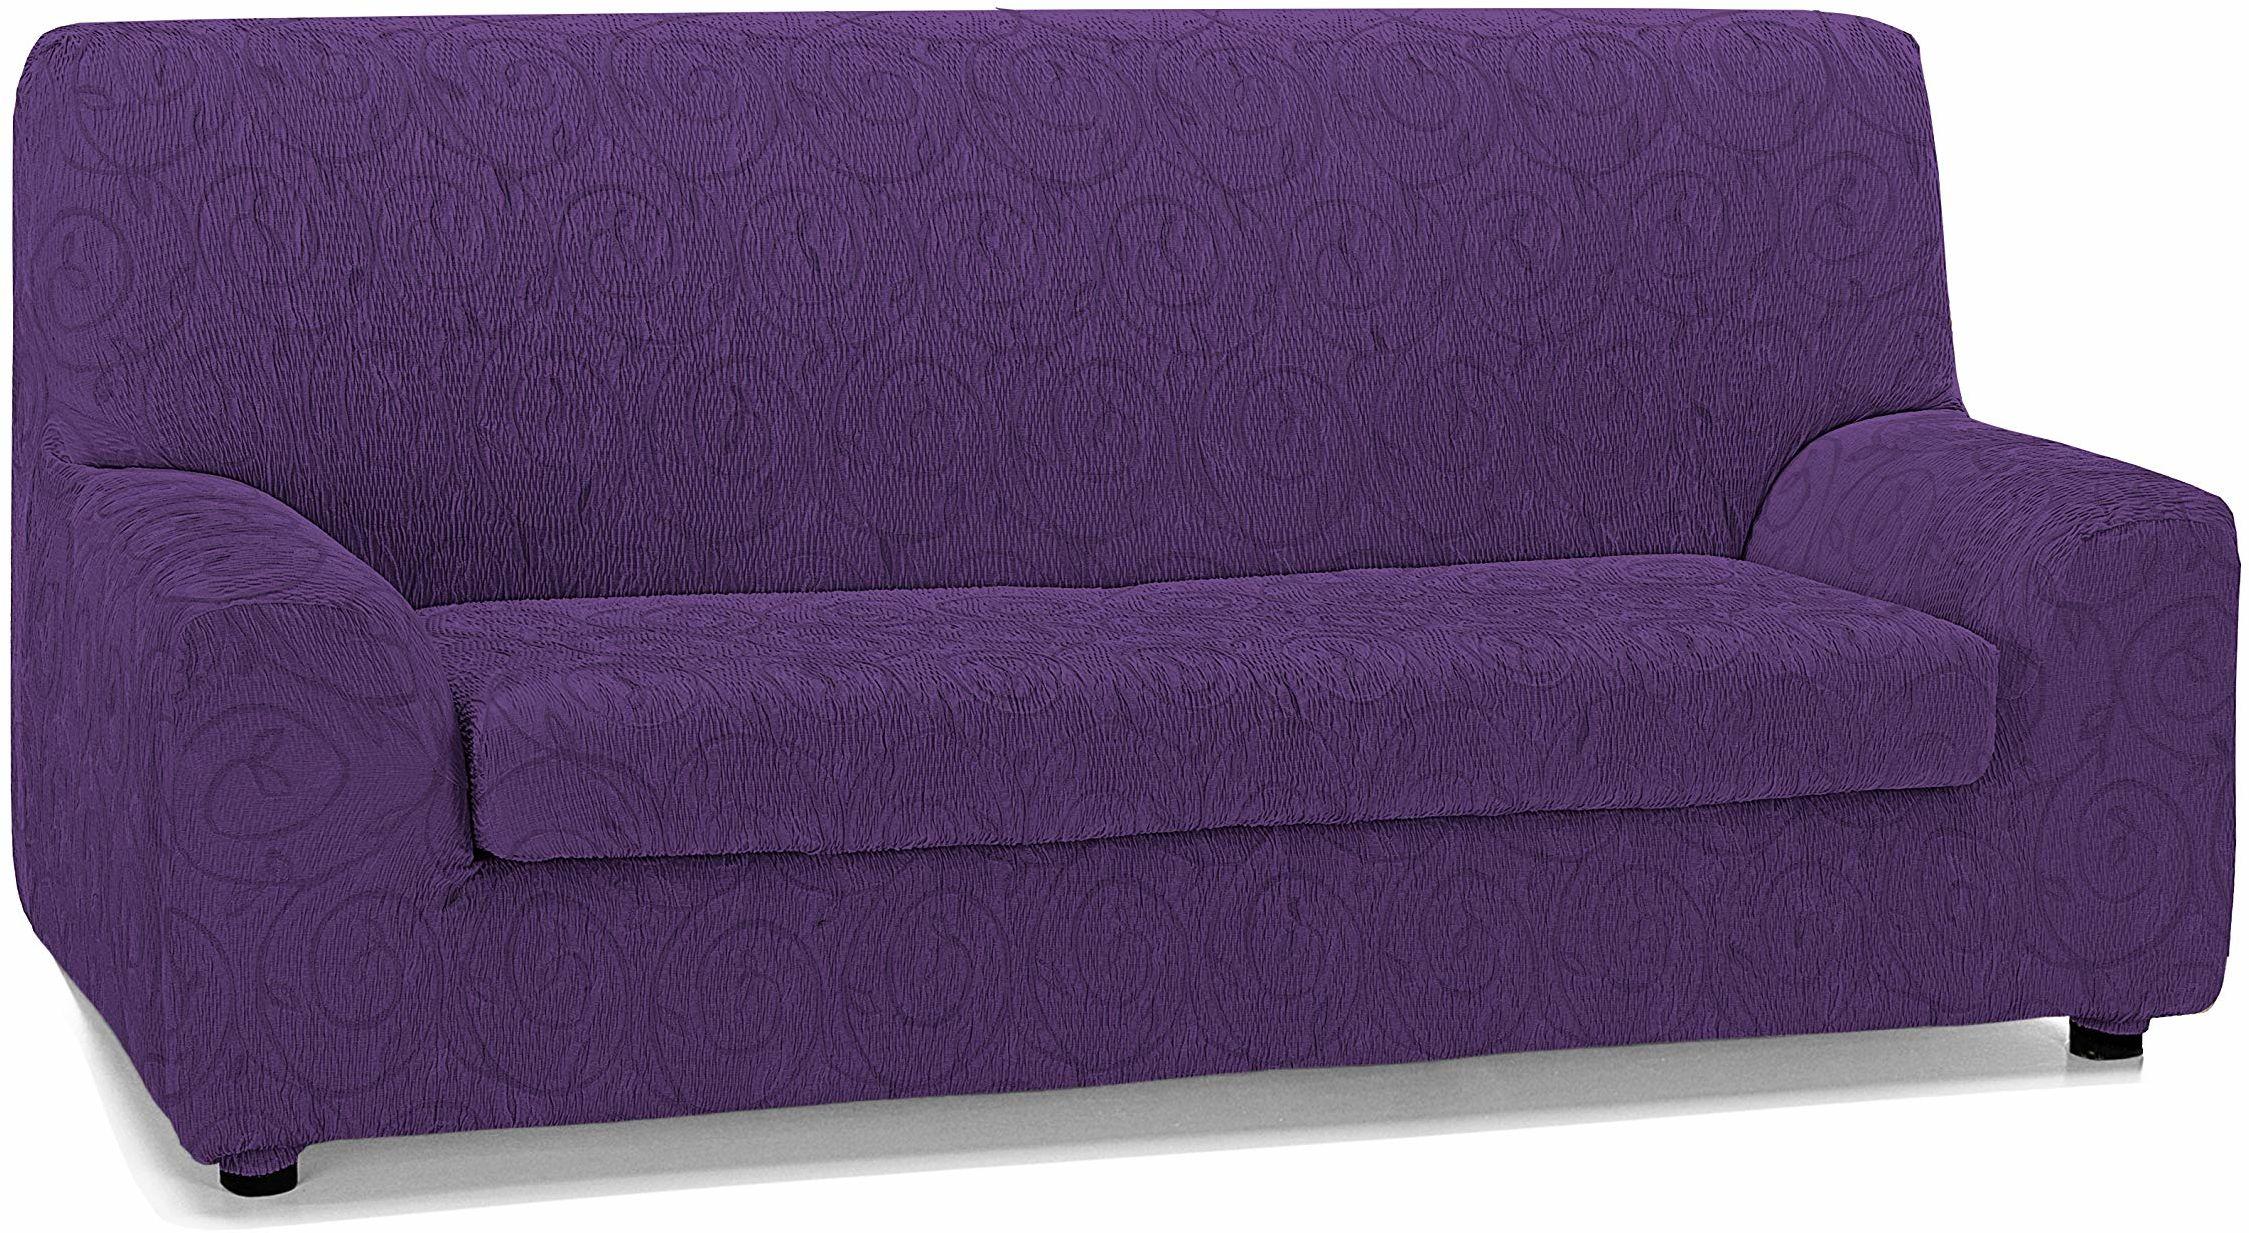 Martina Home Narzuta na sofę 3-osobową, fioletowa